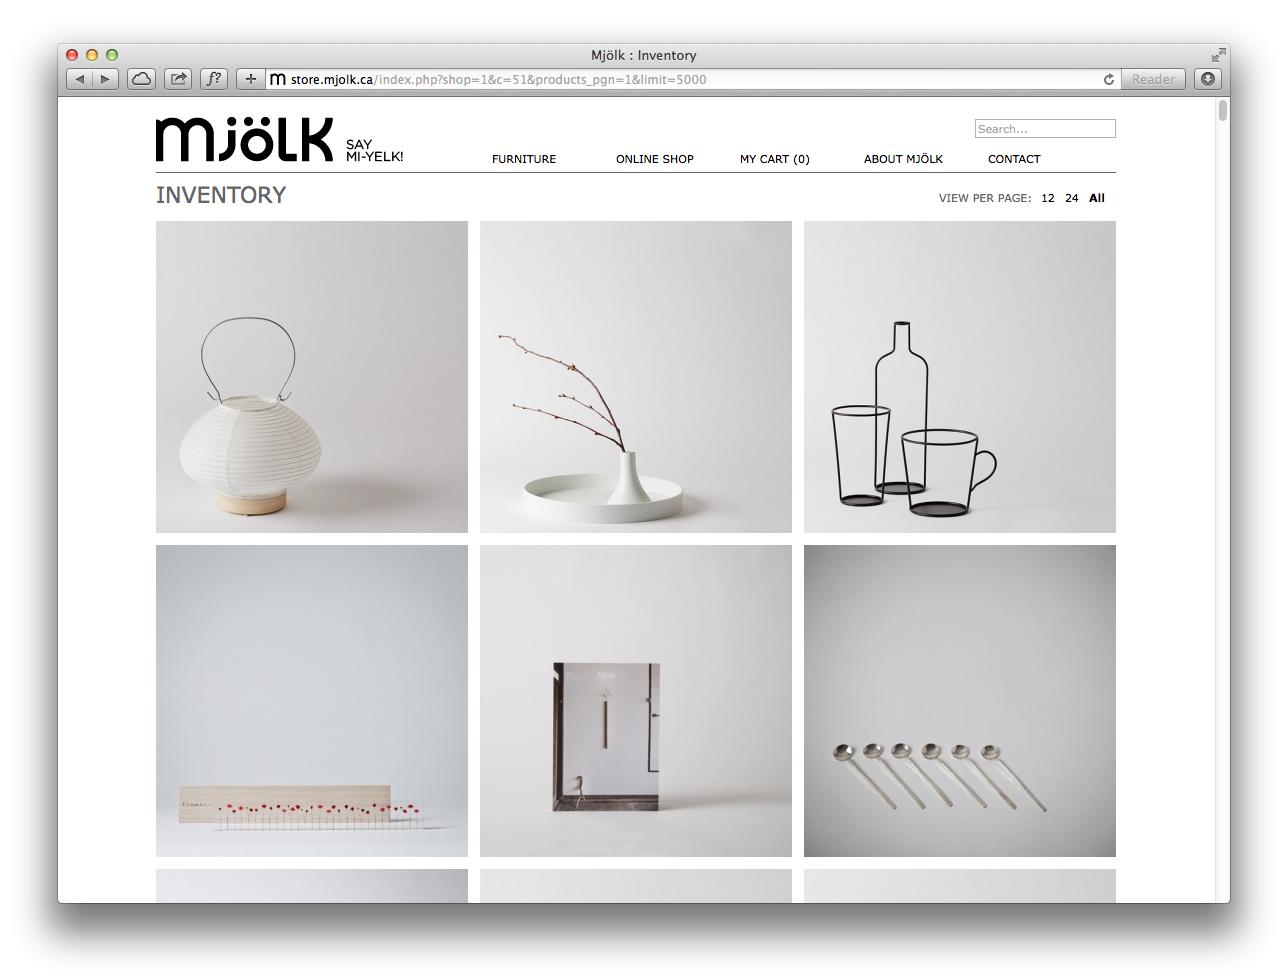 Mjolk_website_gallery.jpg